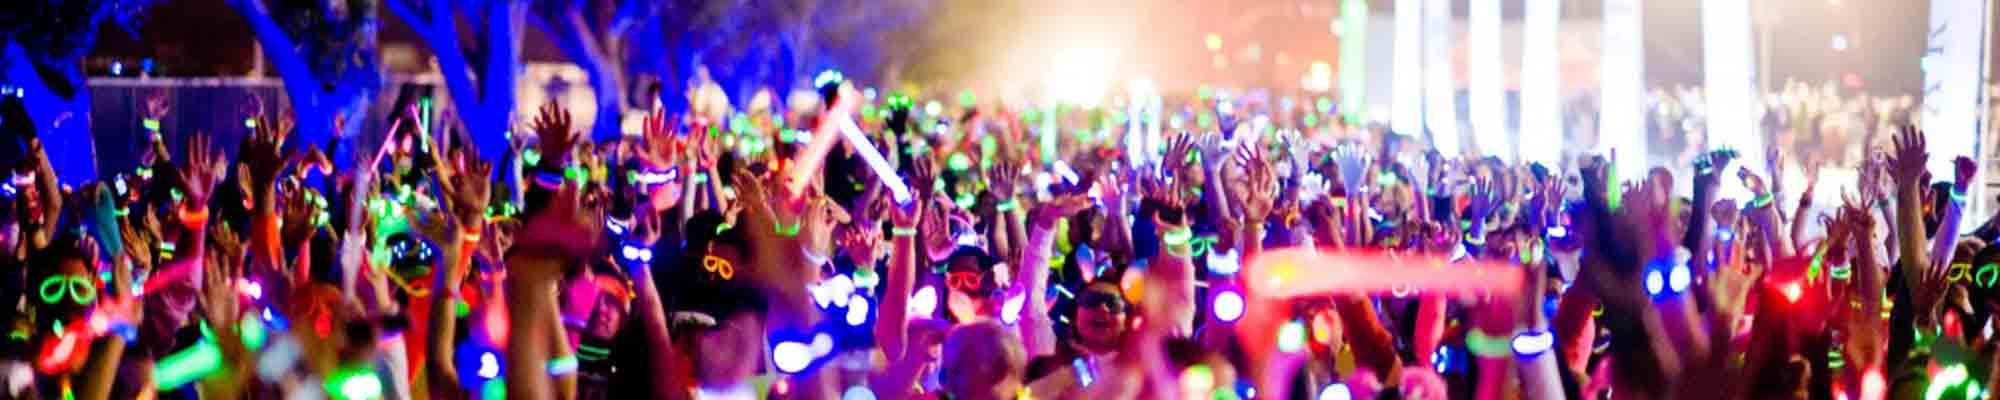 FLUO NIGHT RUN : Bonne humeur, Fluo & Musique !